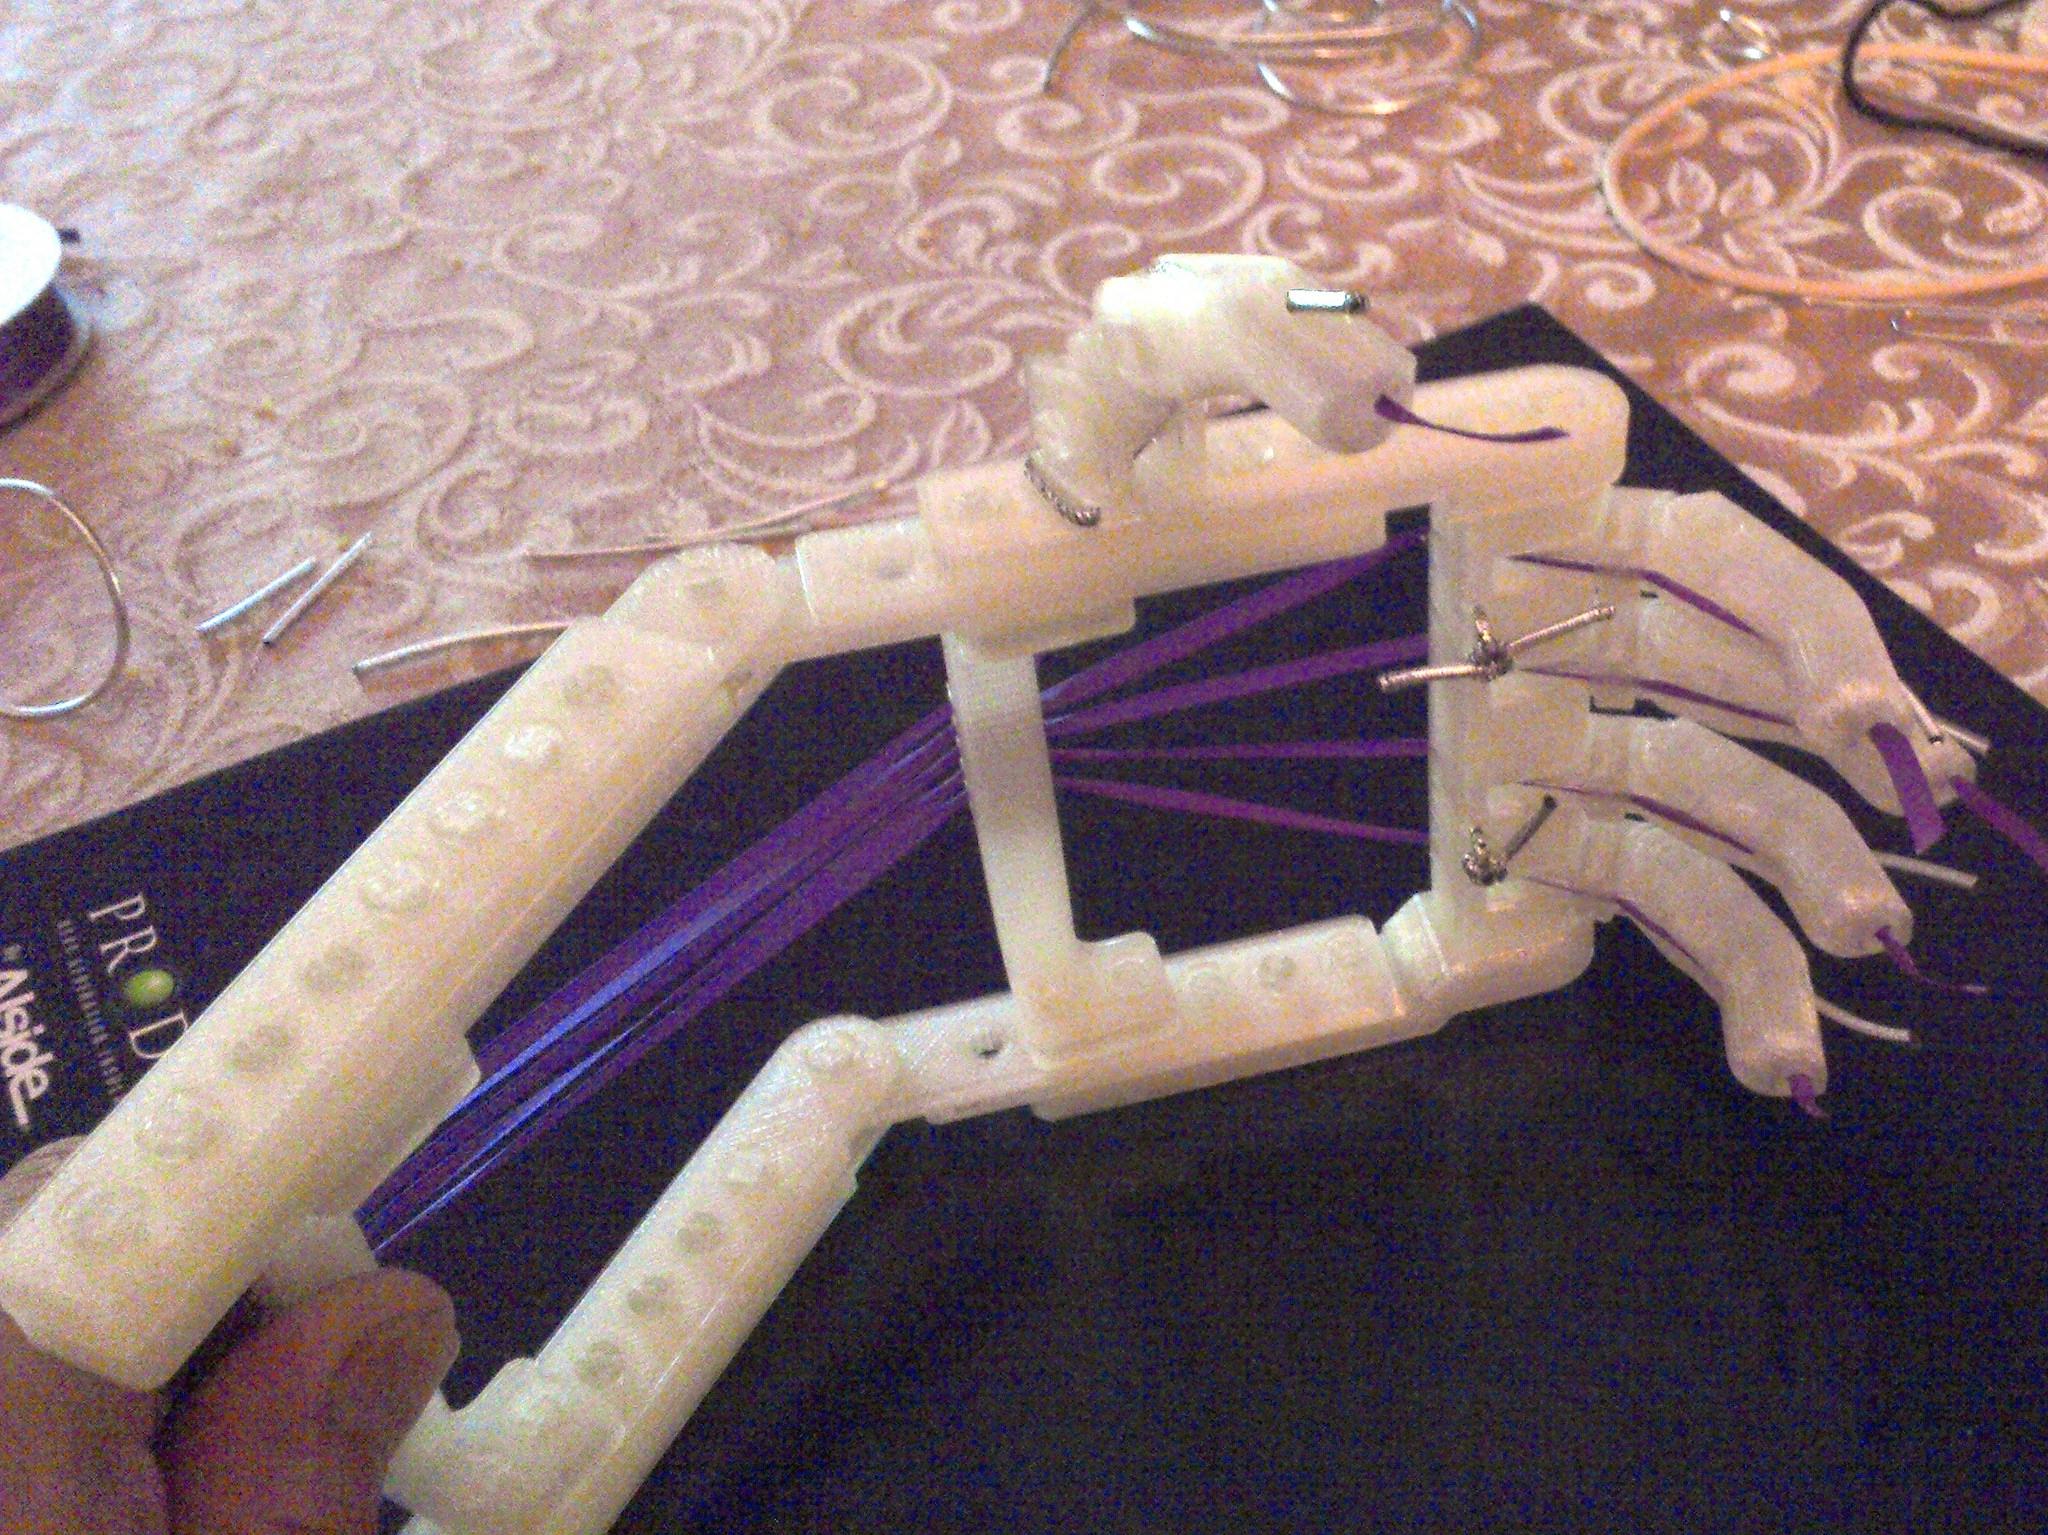 3D Printing Inspiring Example